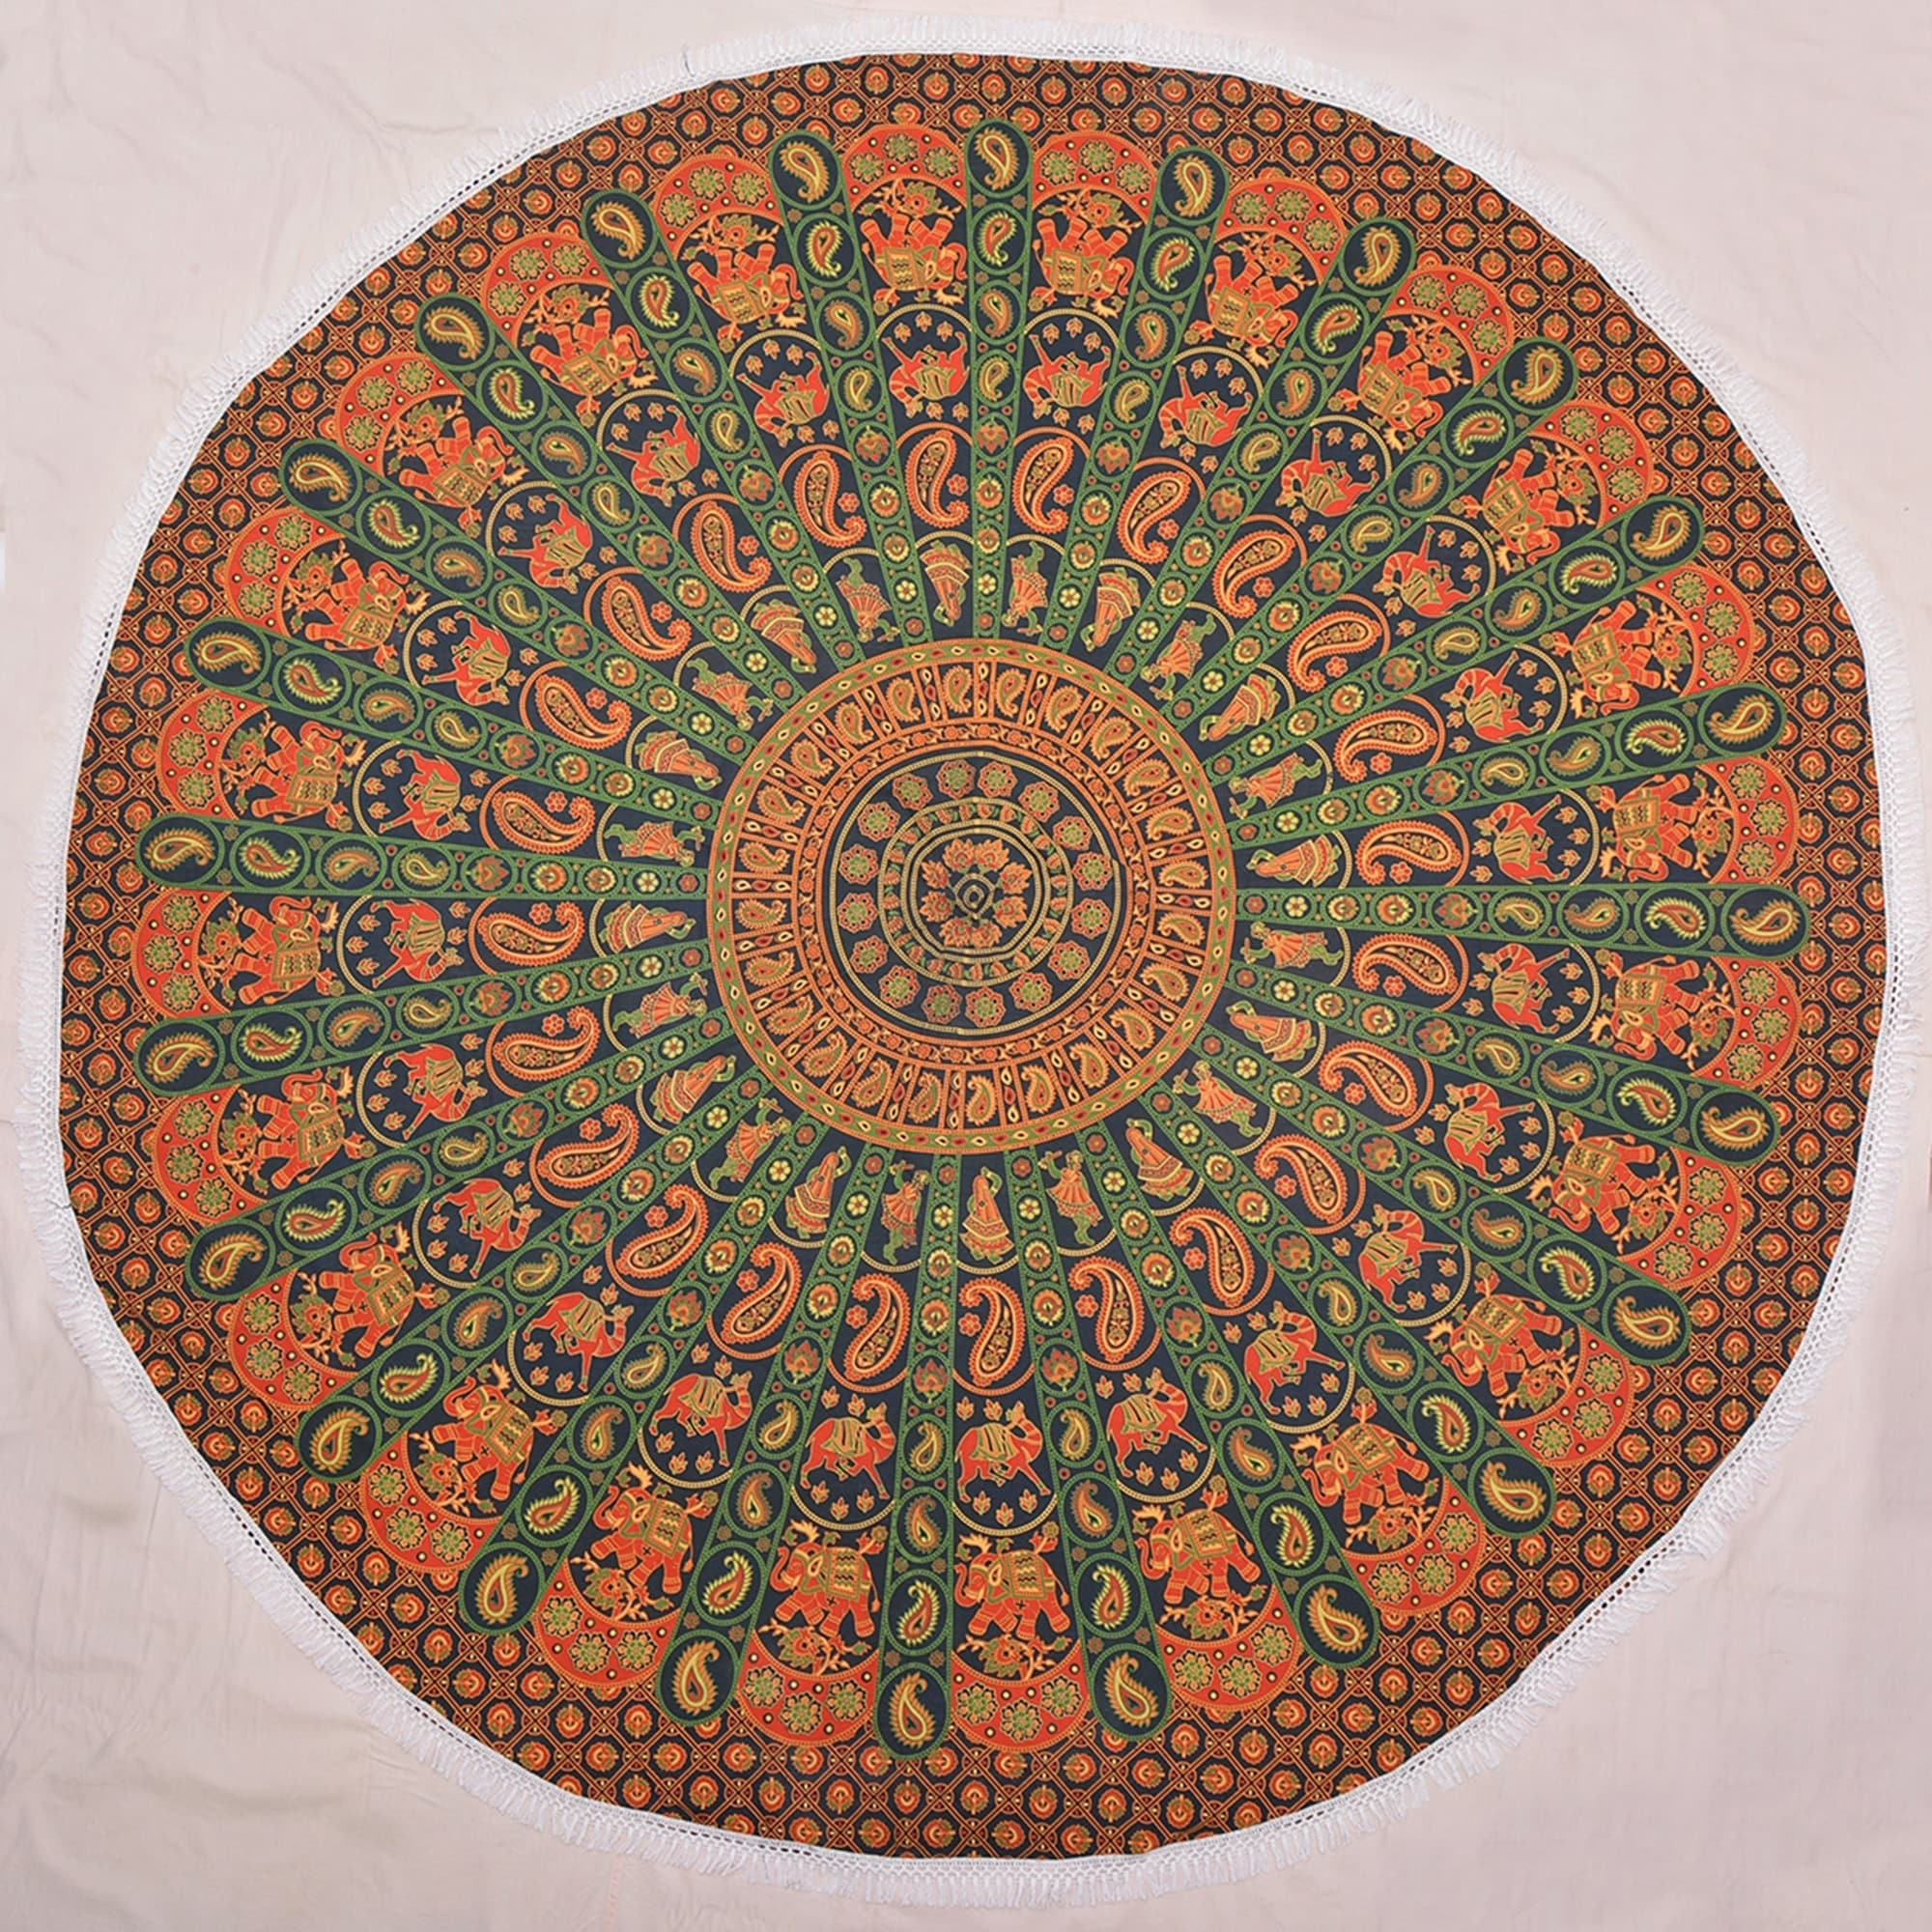 Round Elephant Mandala Tapestry Beach Throw Yoga Mat, Gre...